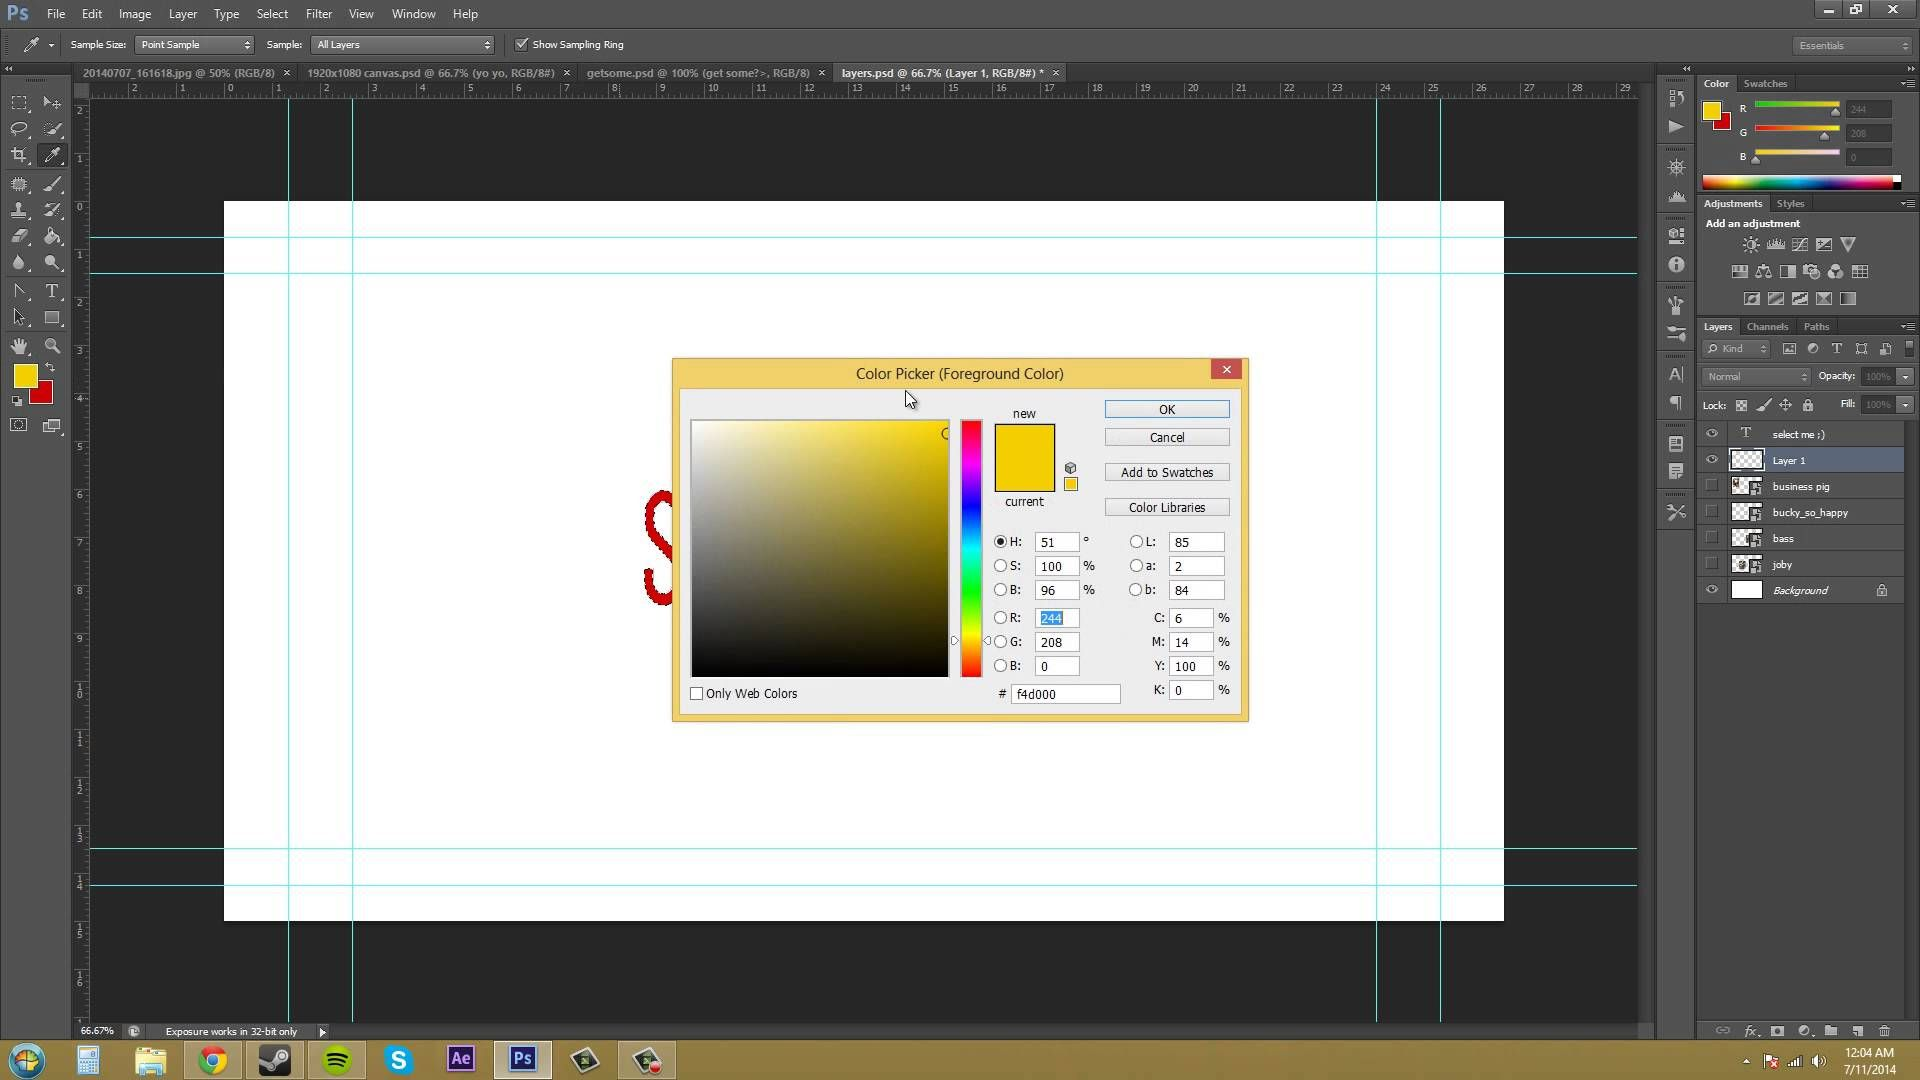 Photoshop cs6 tutorial 50 creating a selection from a layer photoshop cs6 tutorial 50 creating a selection from a layer baditri Image collections